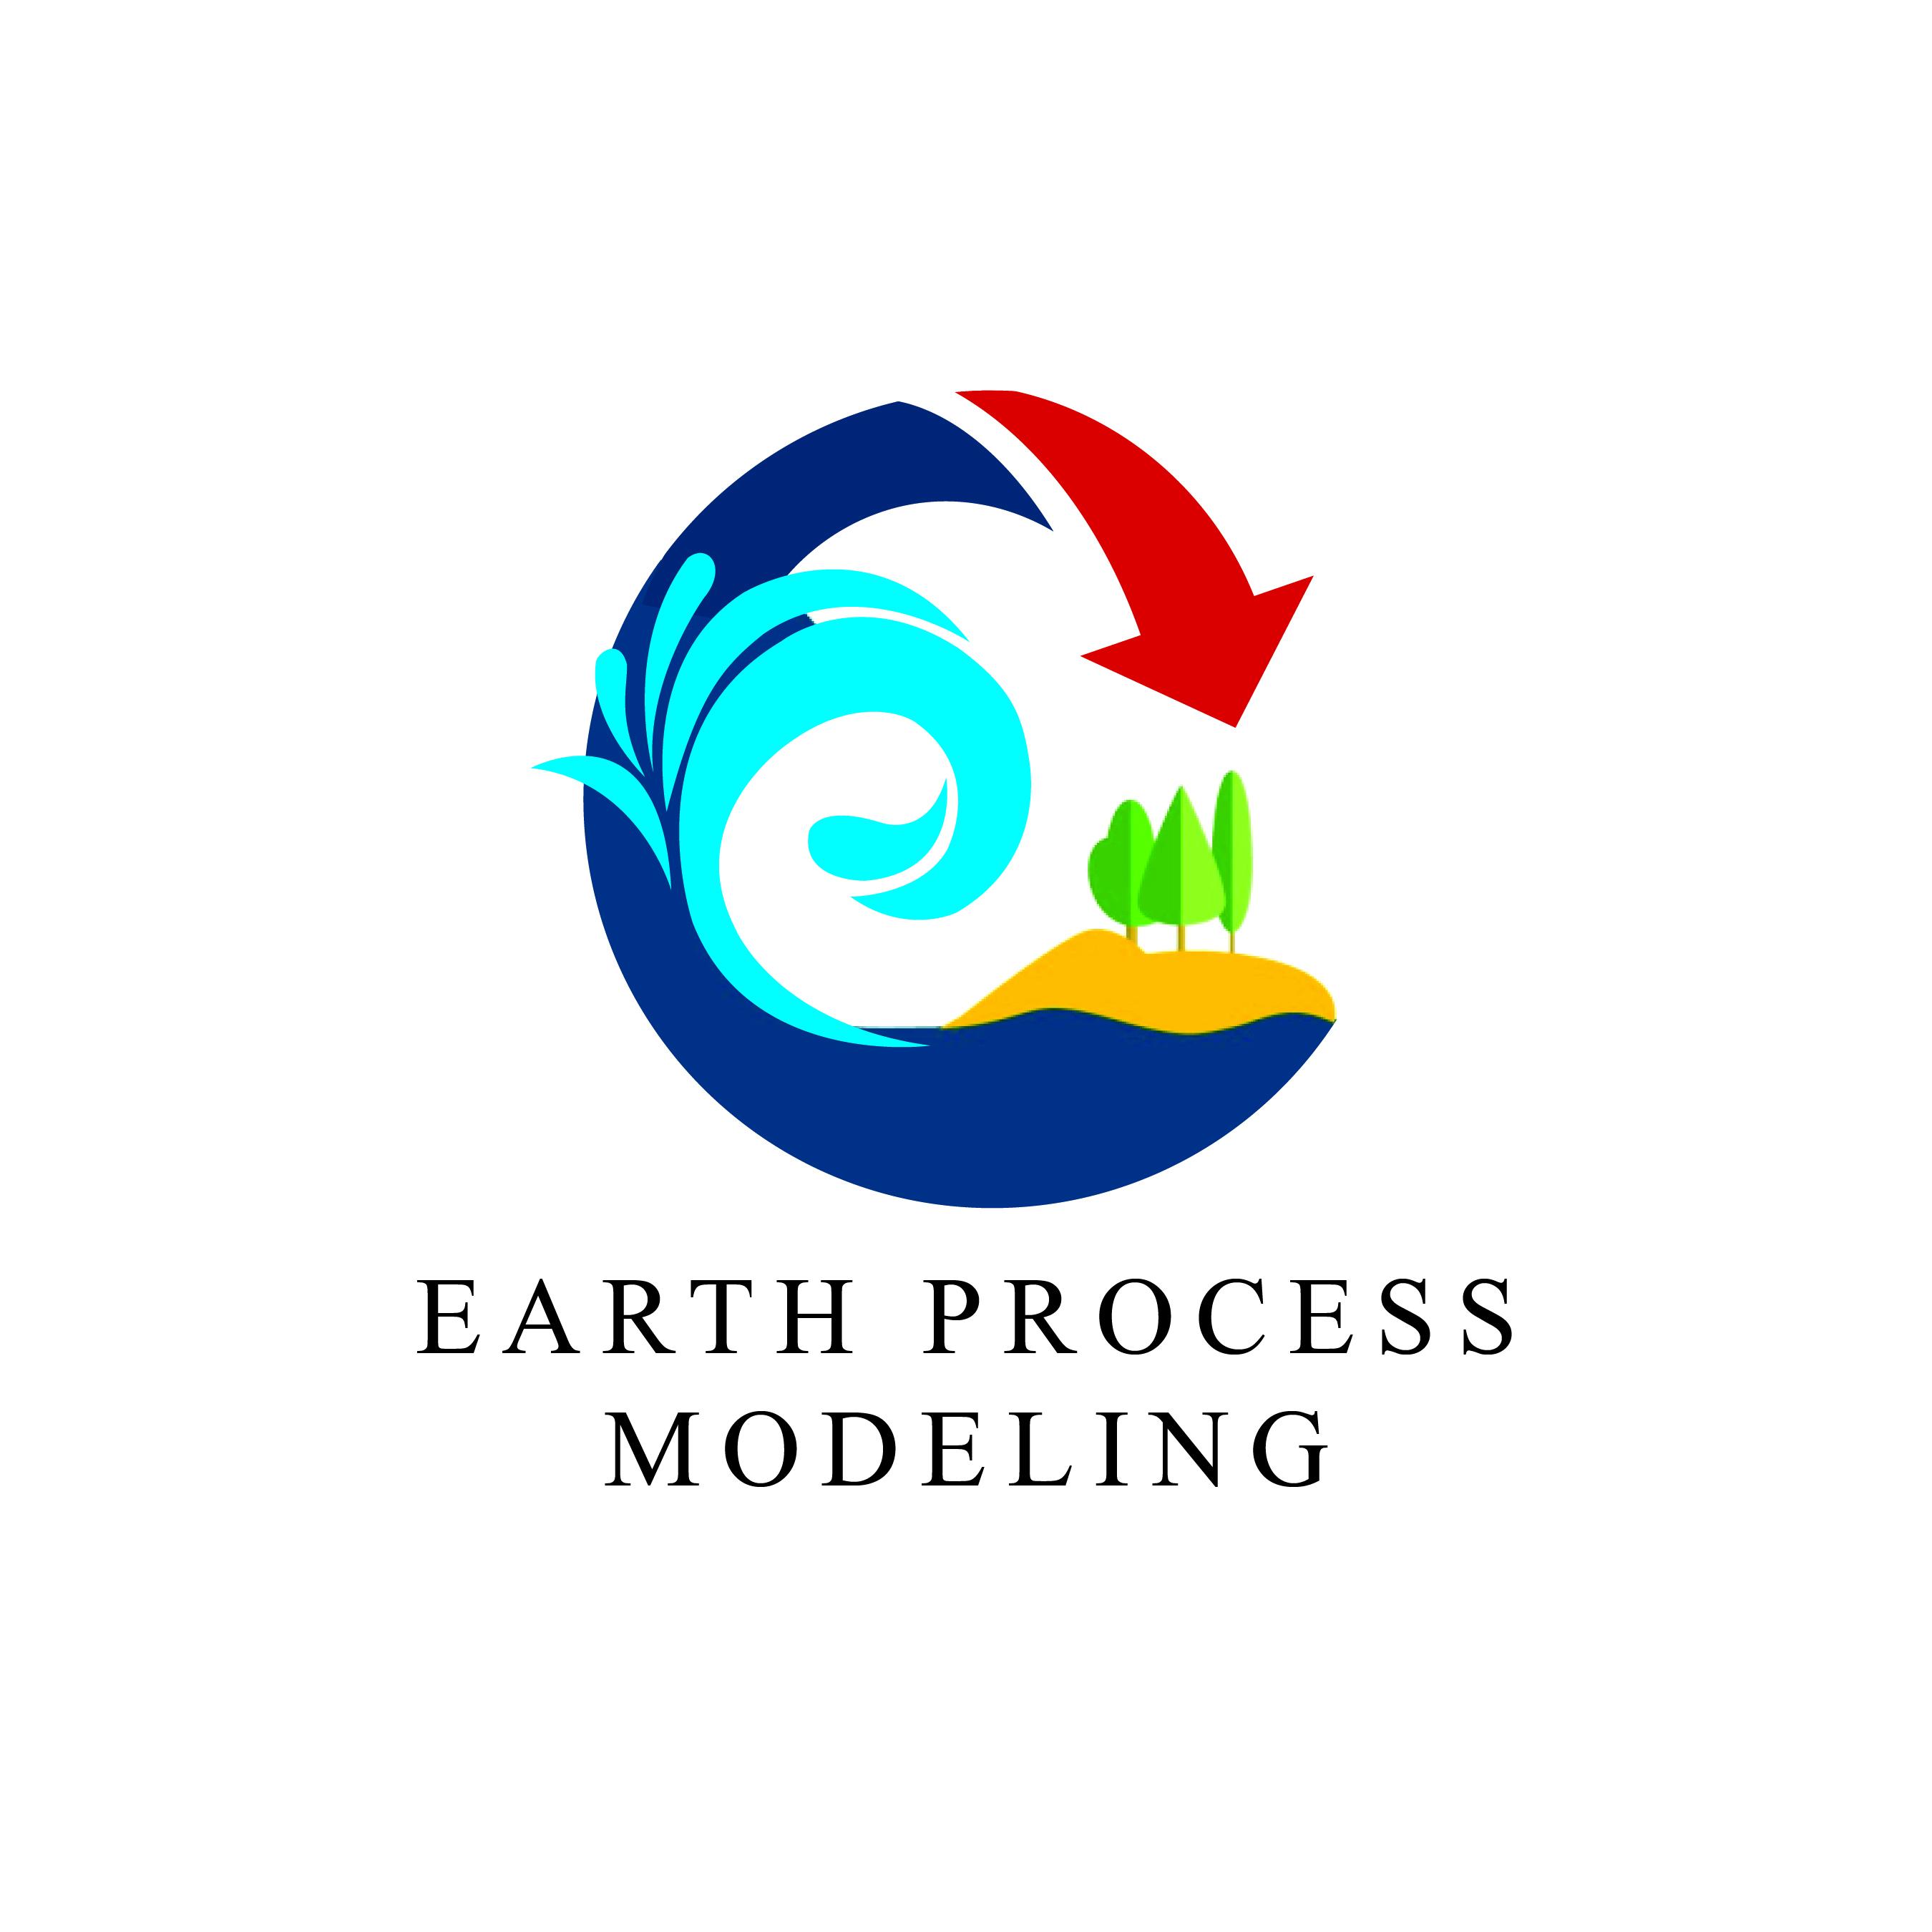 Earth Process Modeling